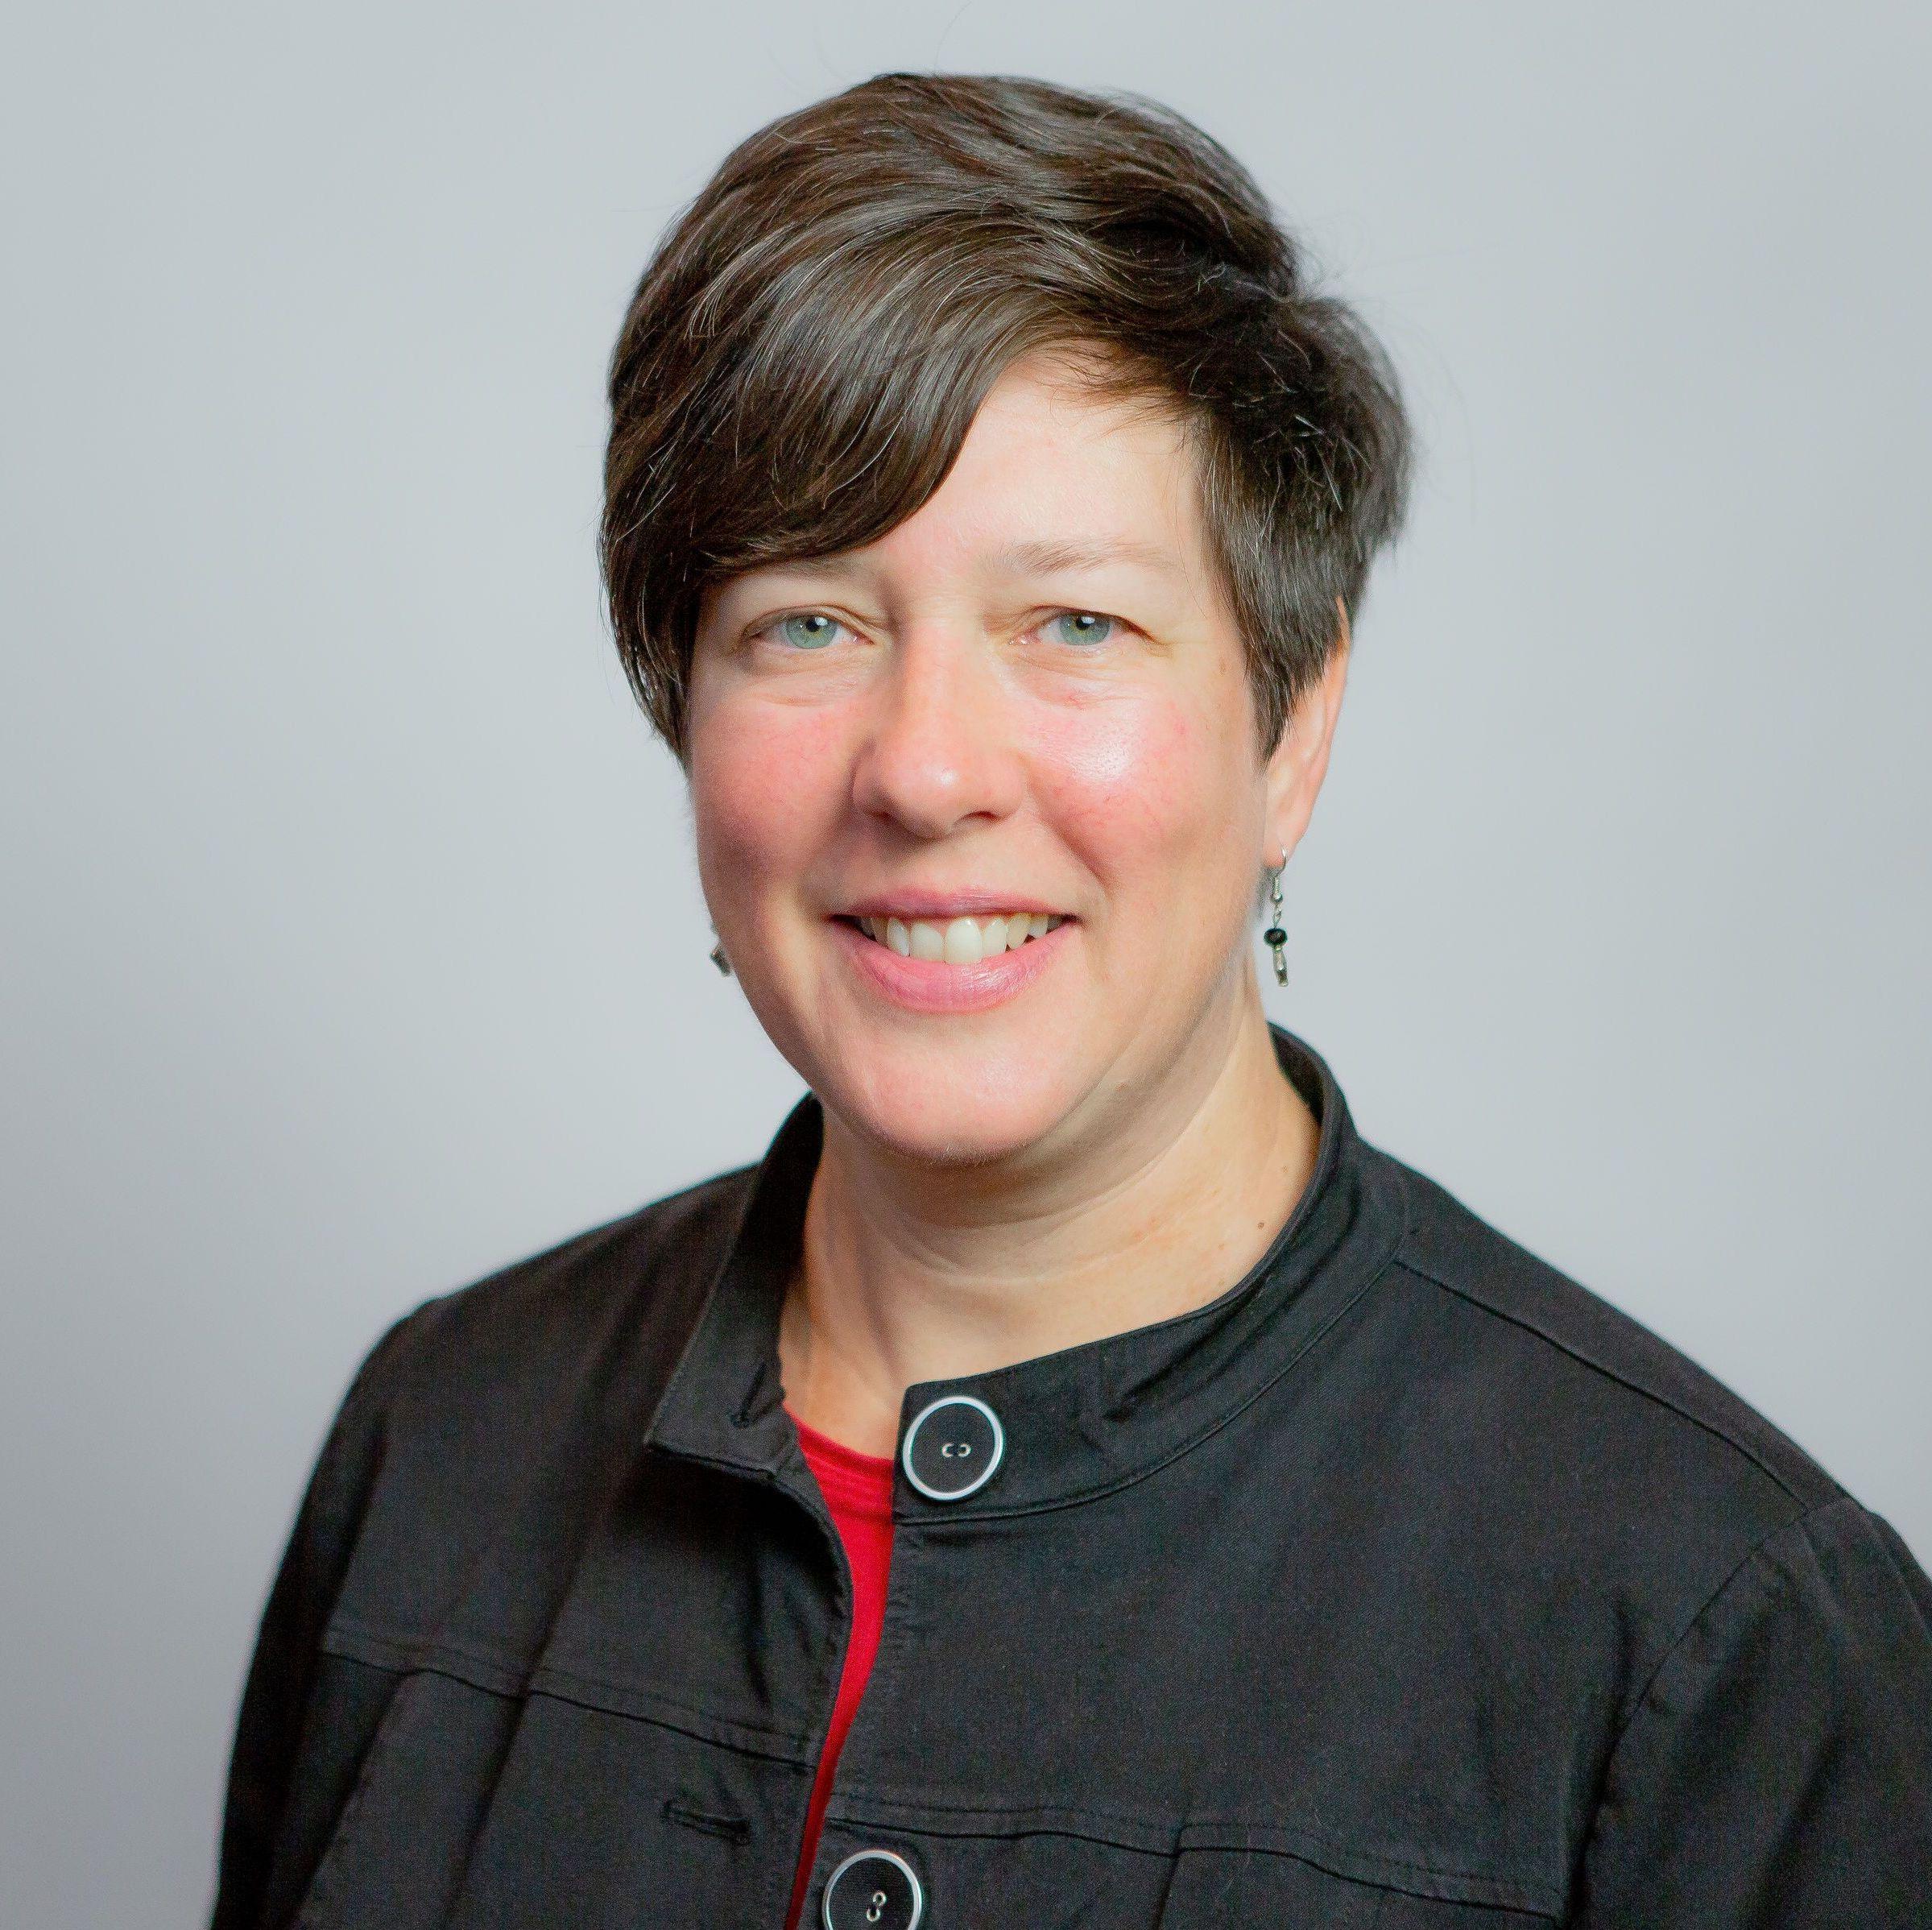 Suzanne Bertin